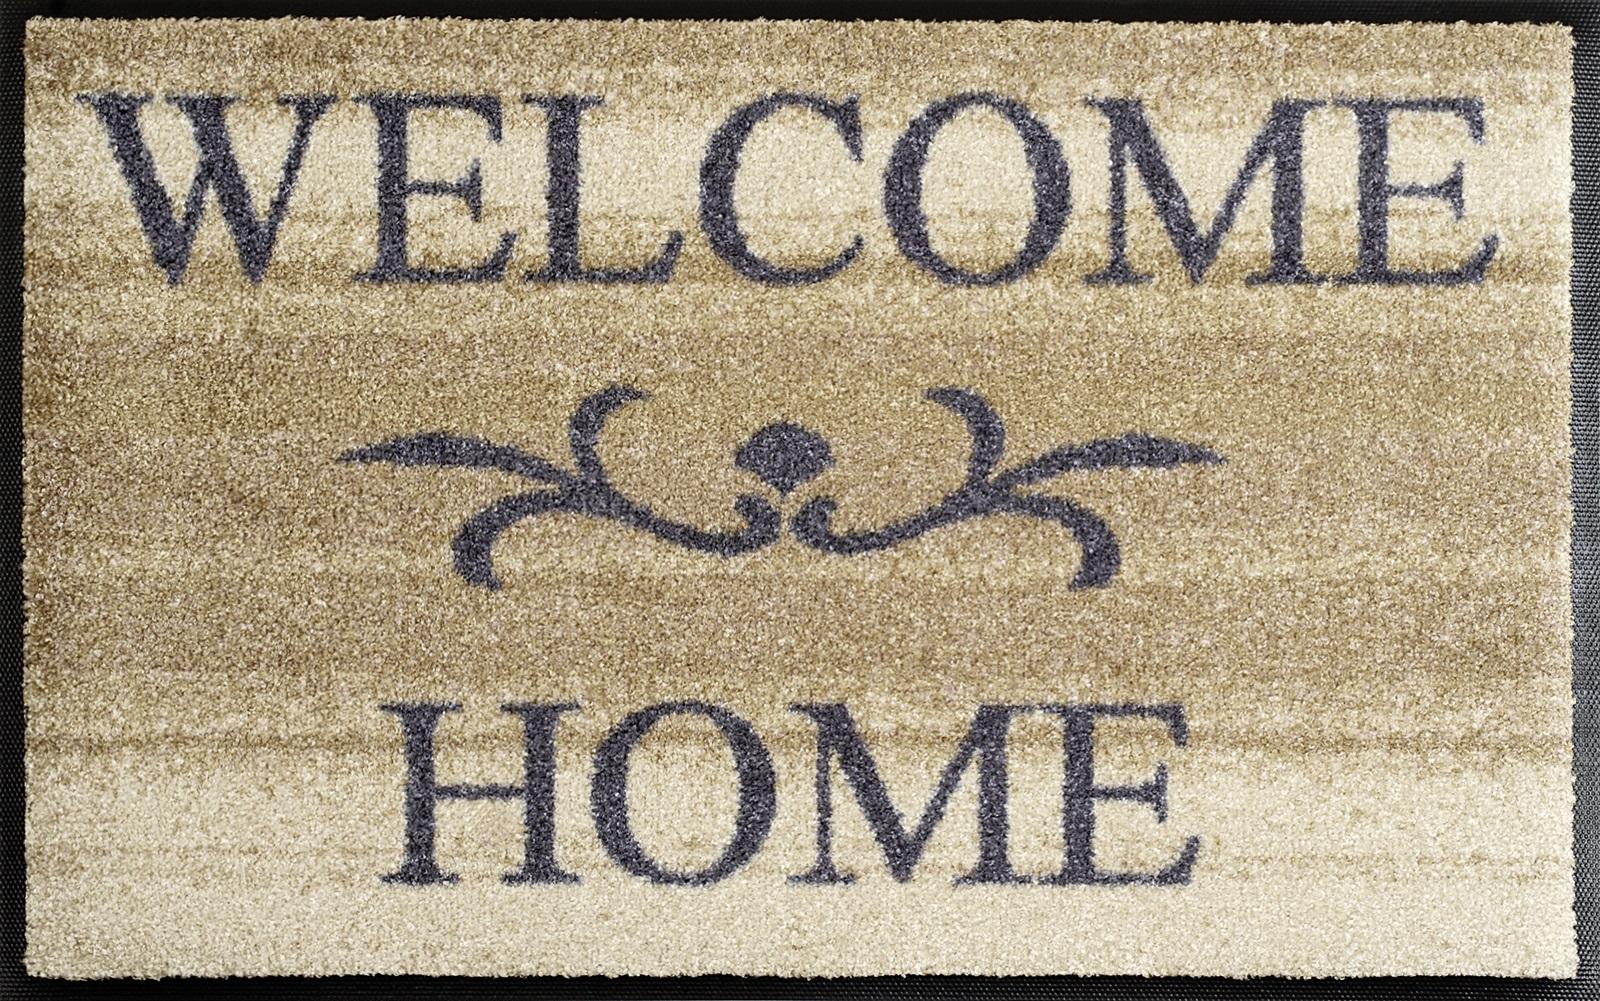 waschbare fu matte welcome home 50x75 cm. Black Bedroom Furniture Sets. Home Design Ideas